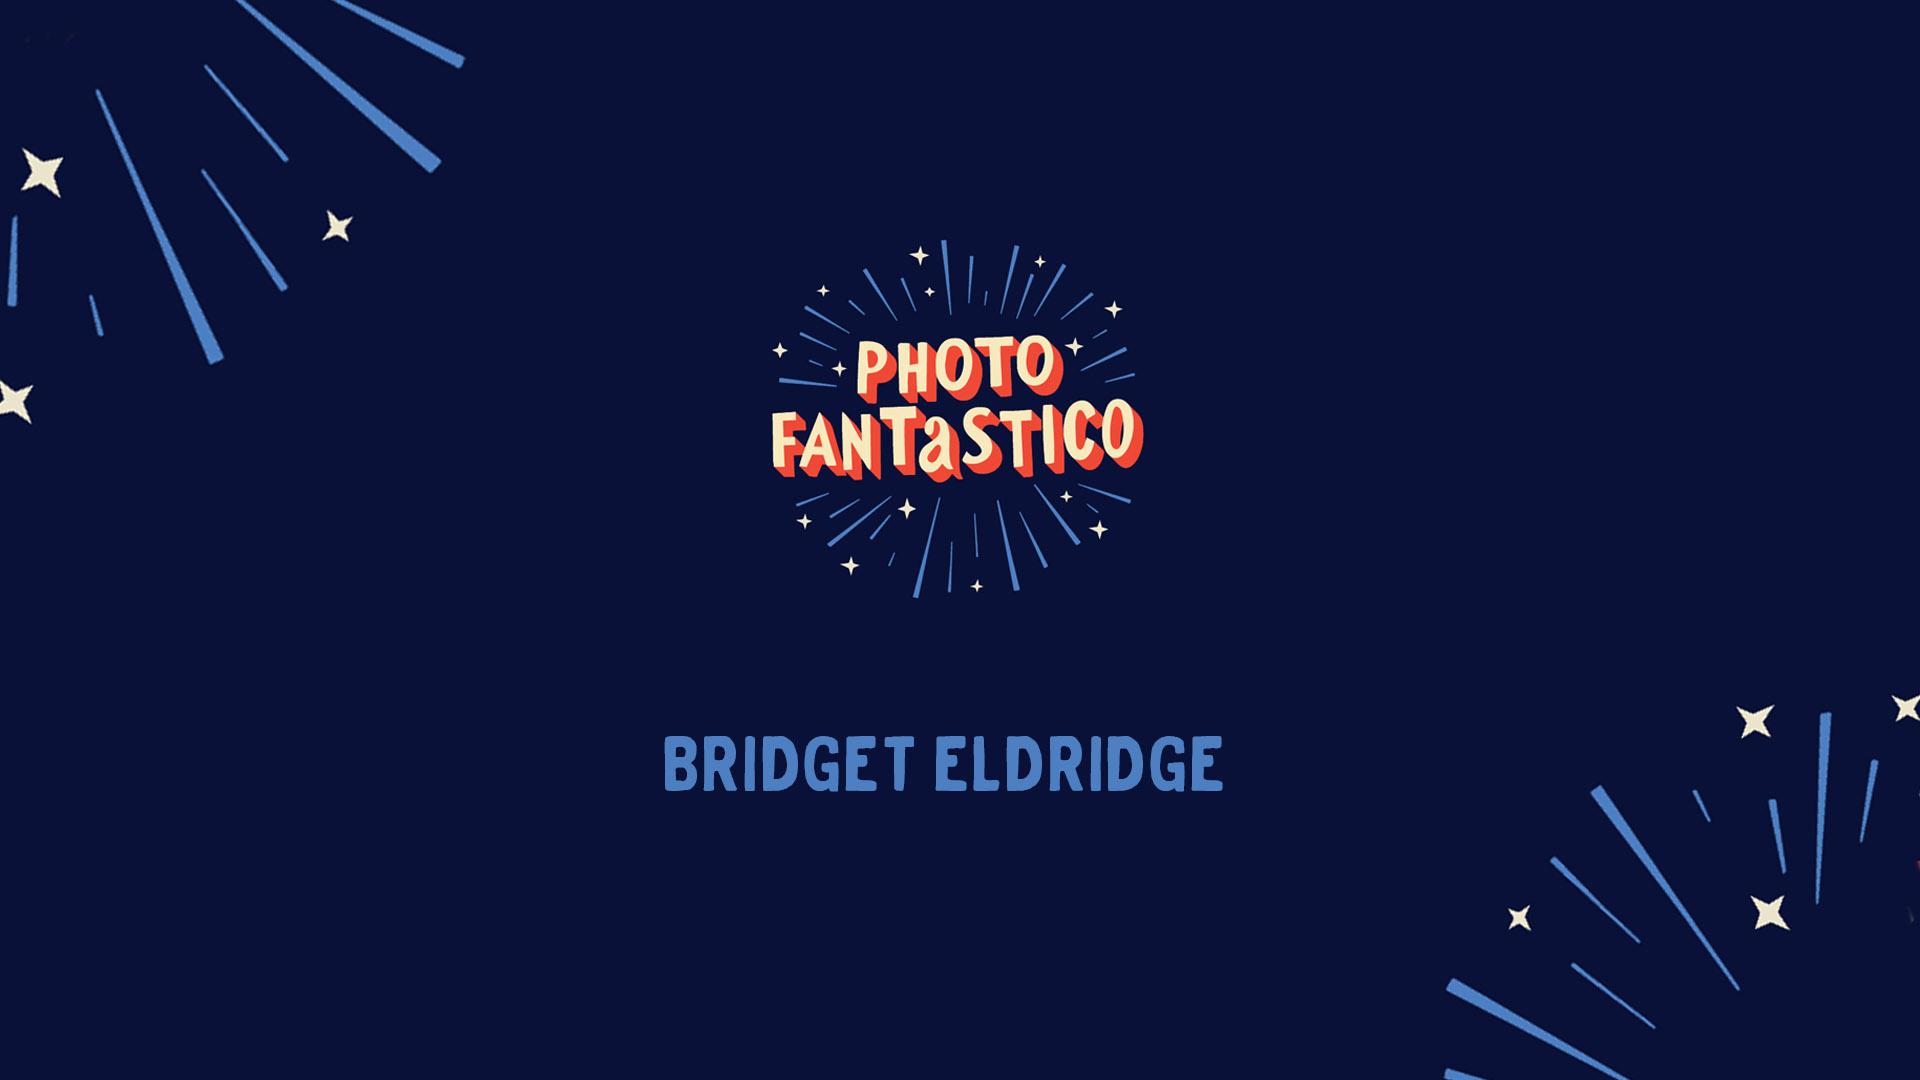 Bridget Eldridge